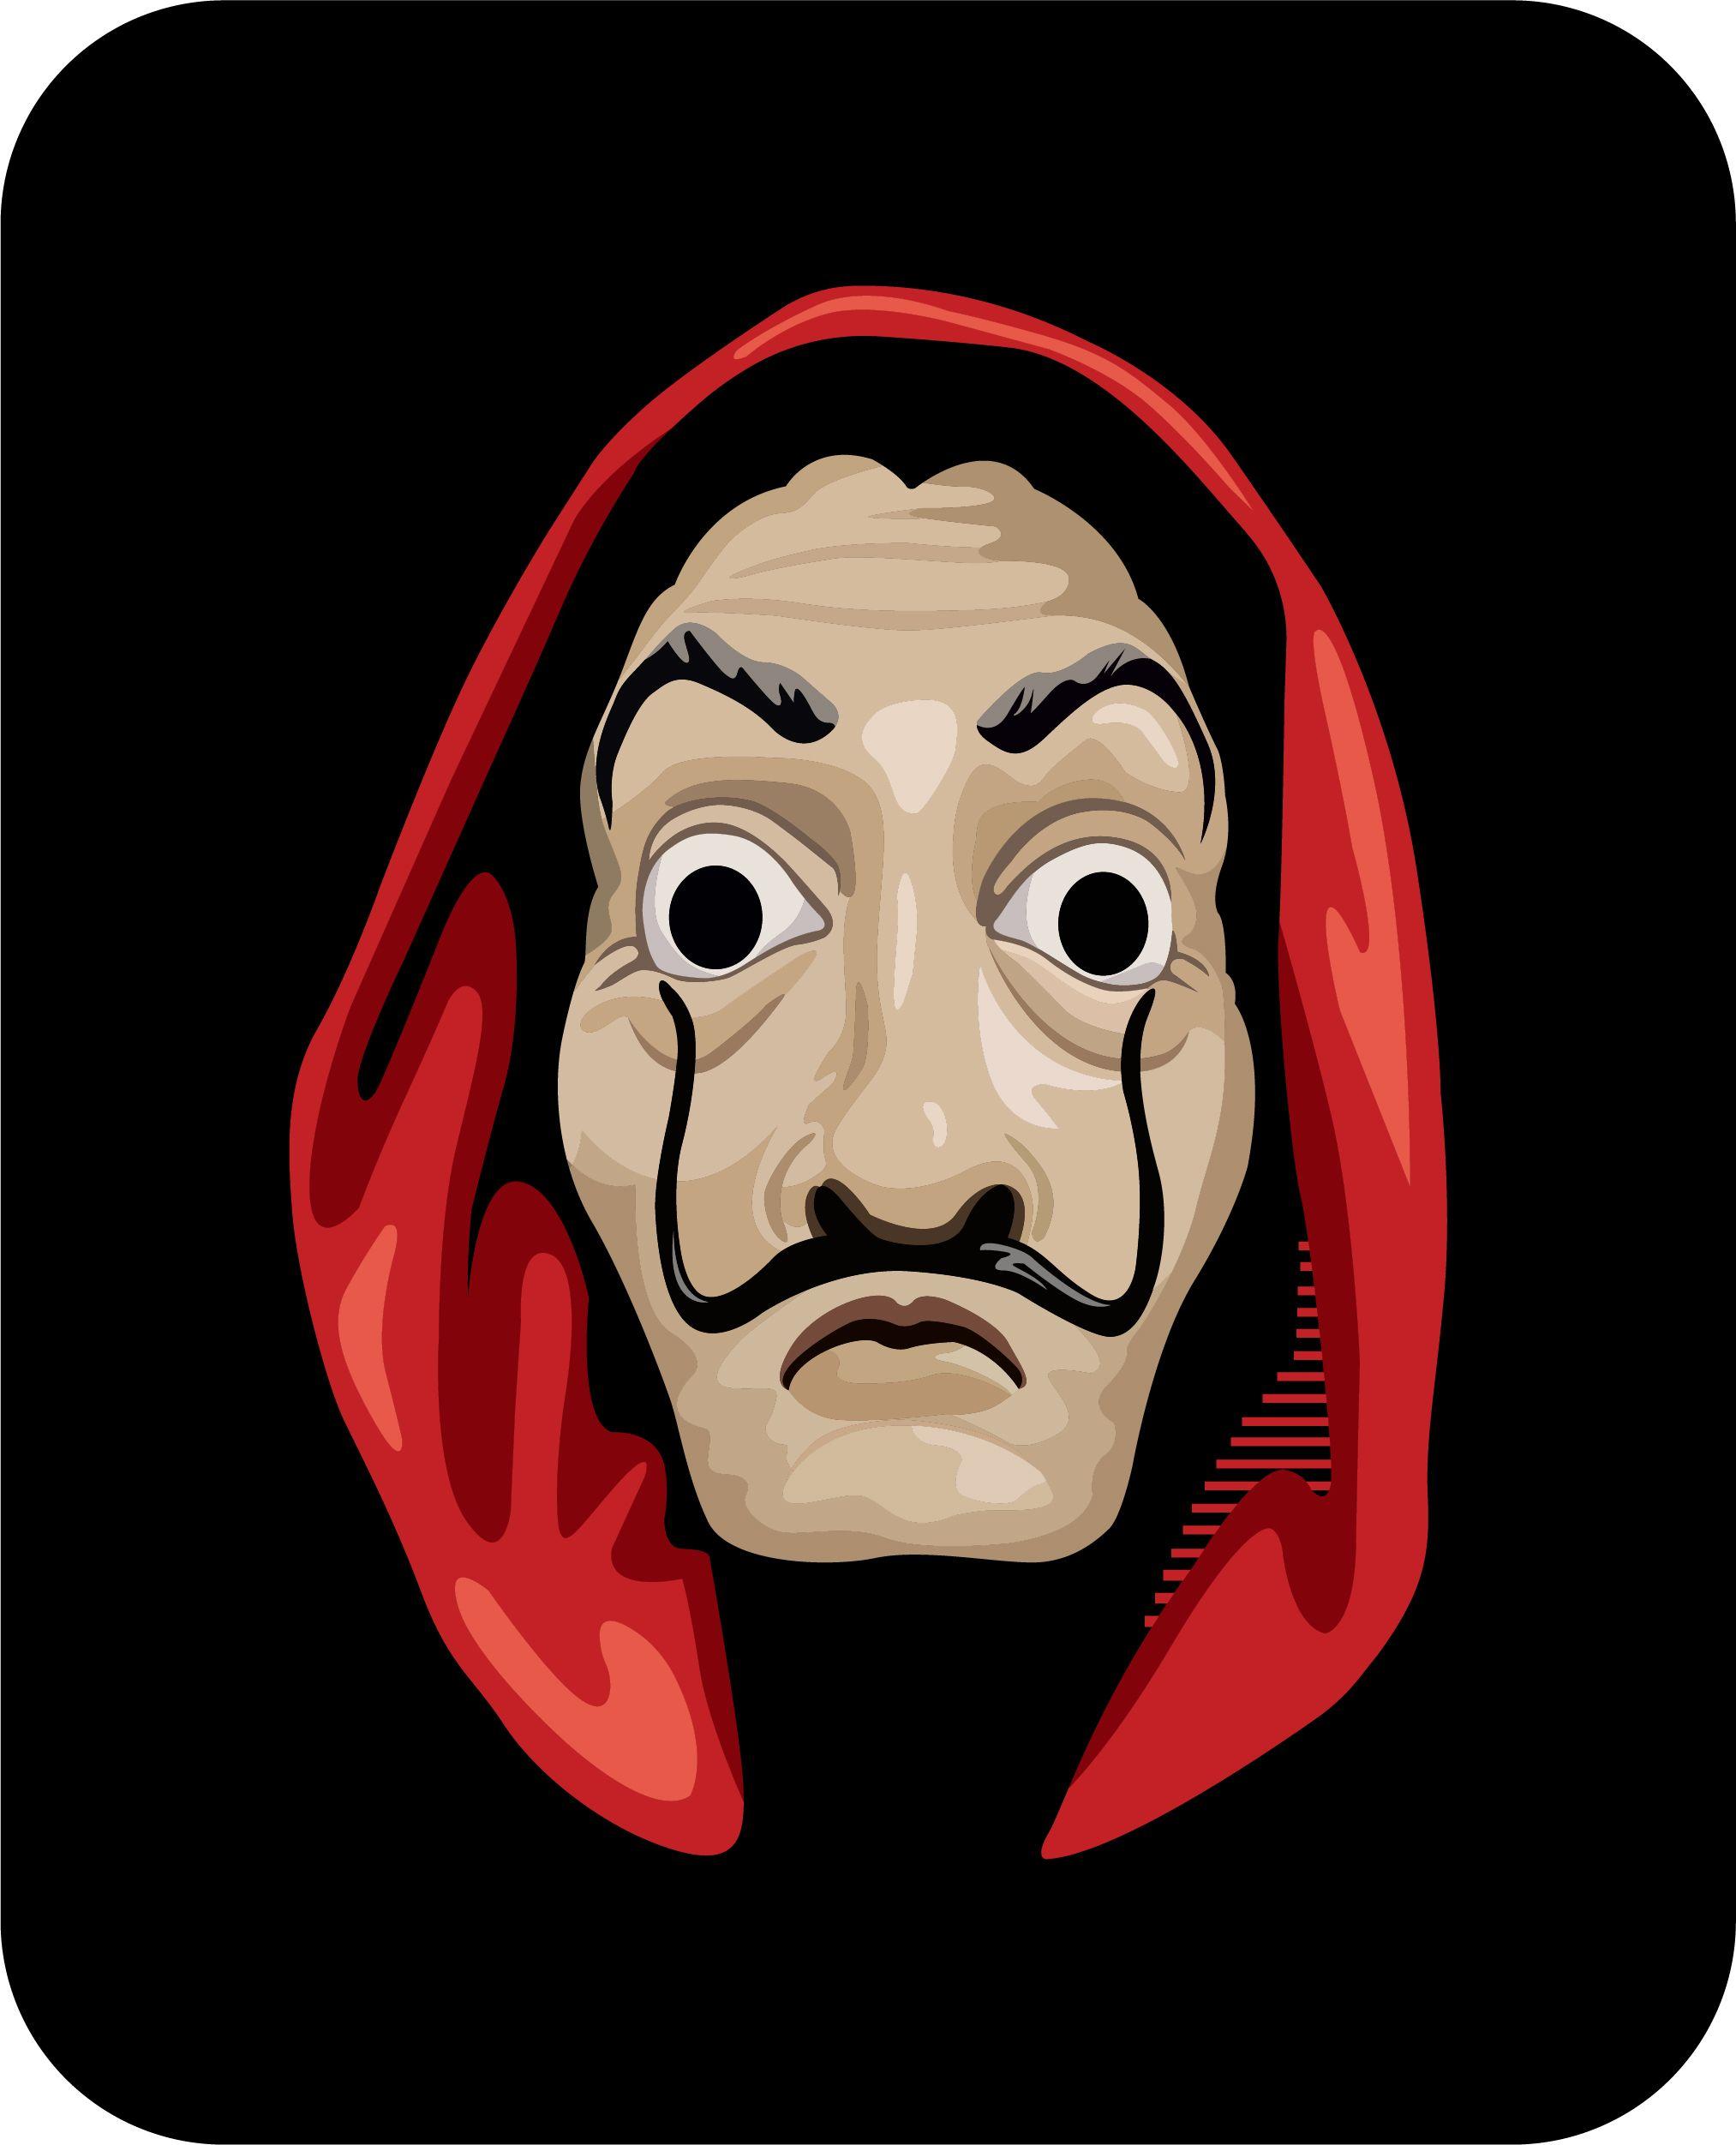 Money Heist Mask Mask Drawing Drawings Money Heist Mask